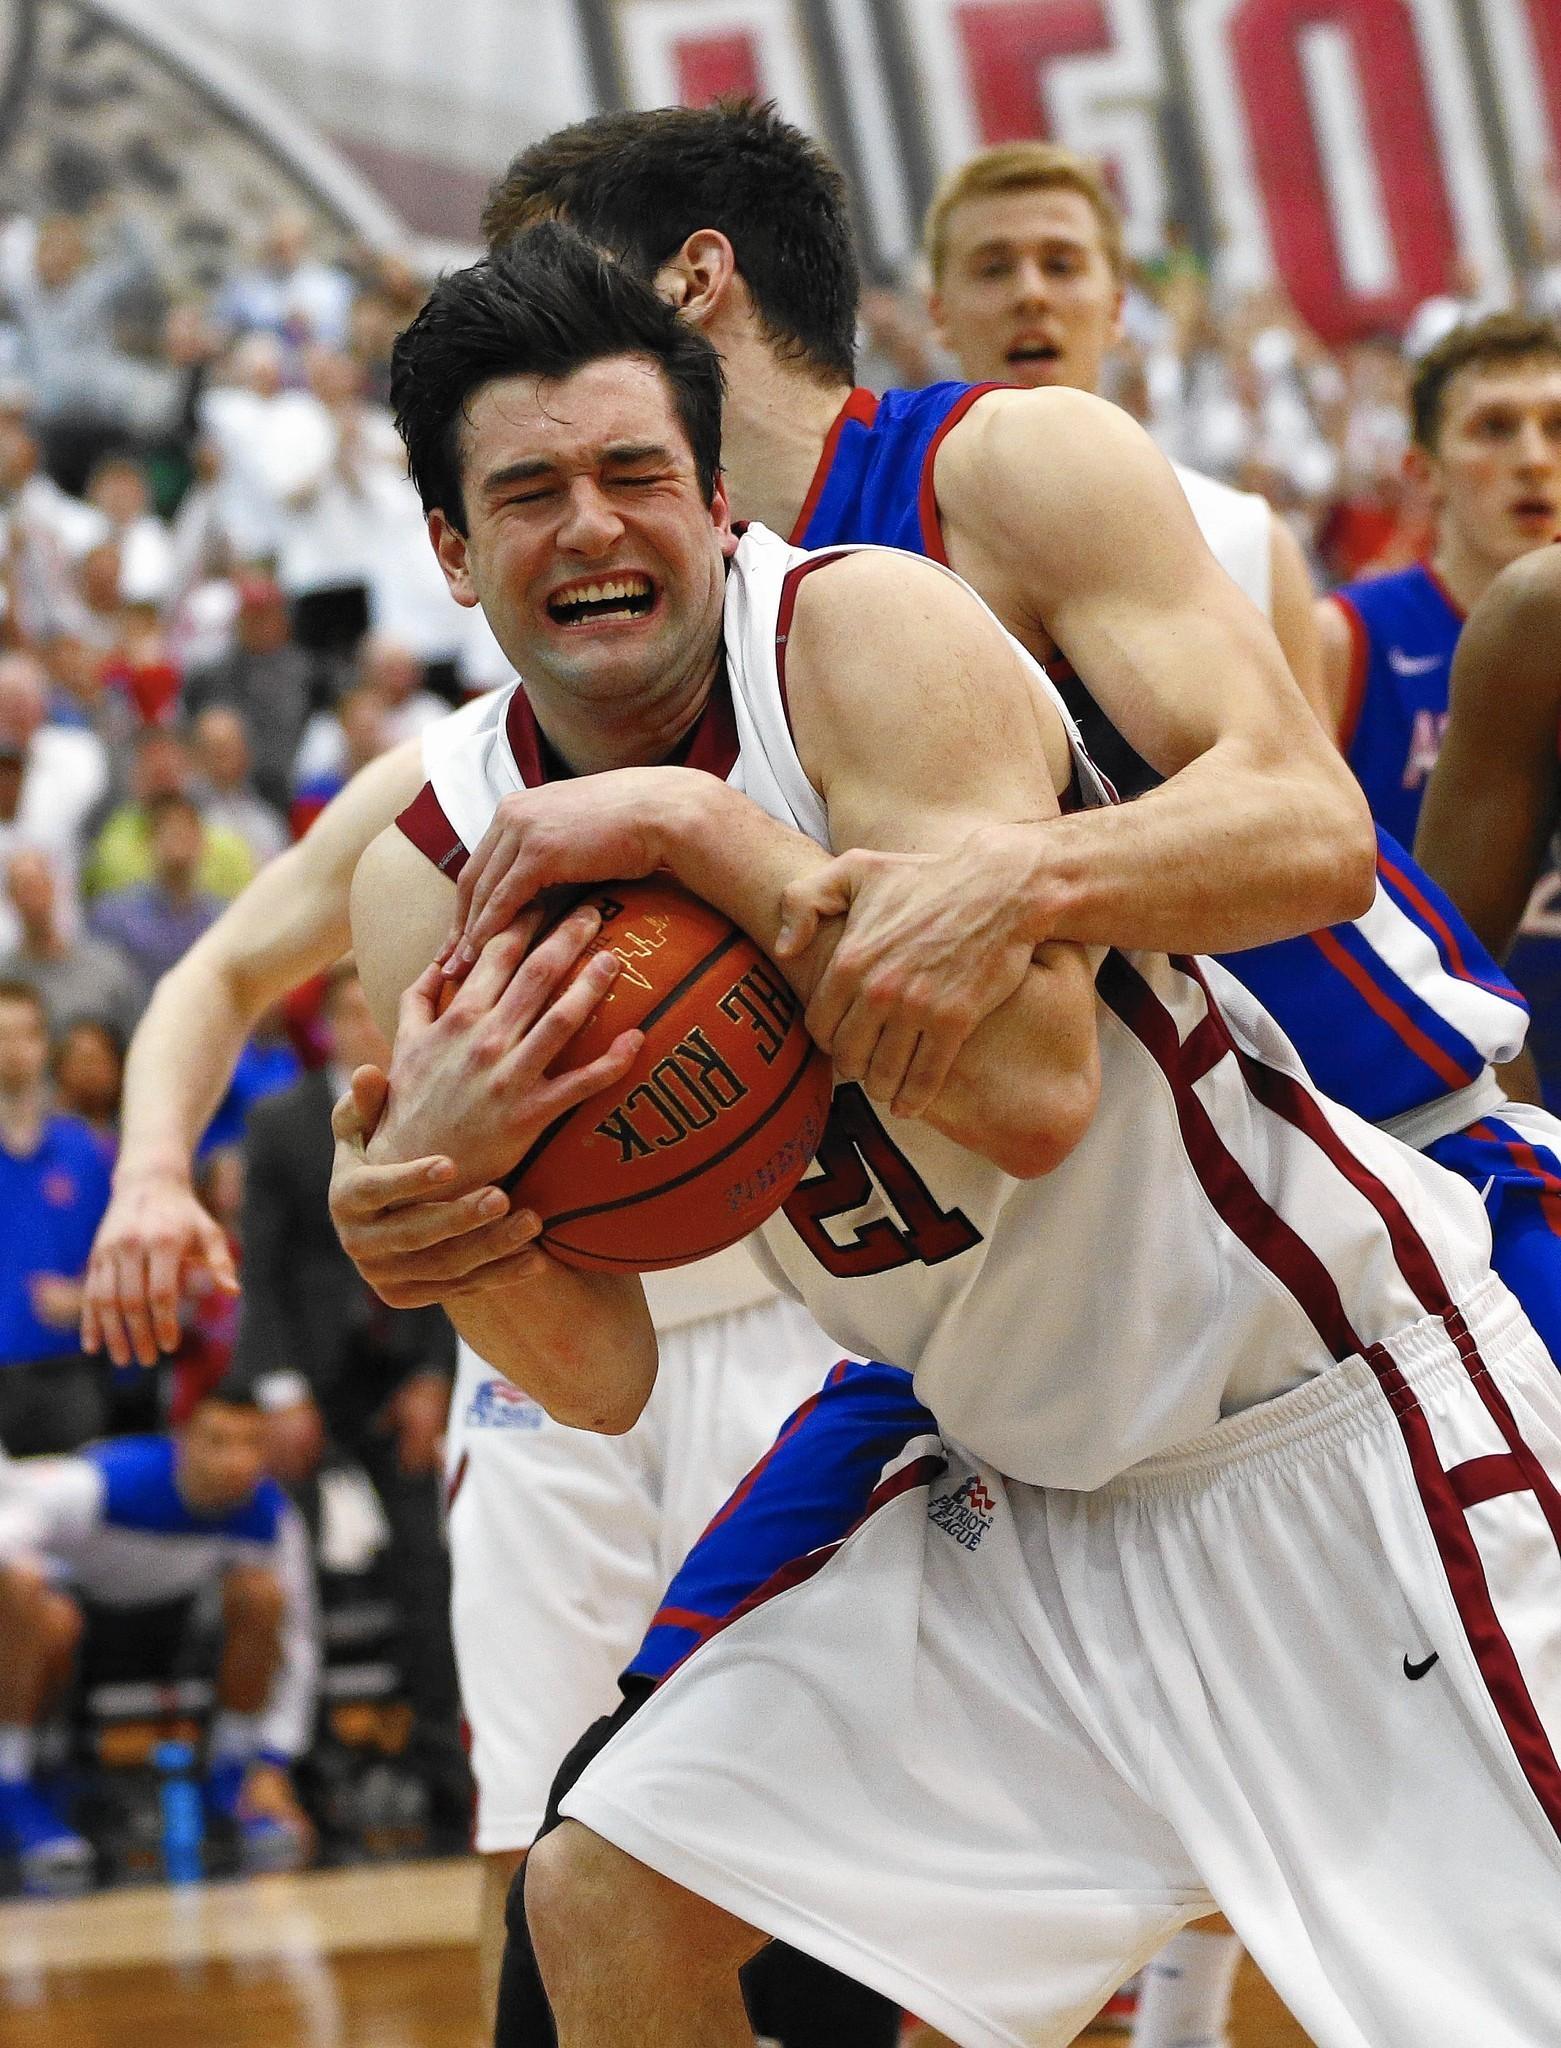 List of basketball leagues - Wikipedia